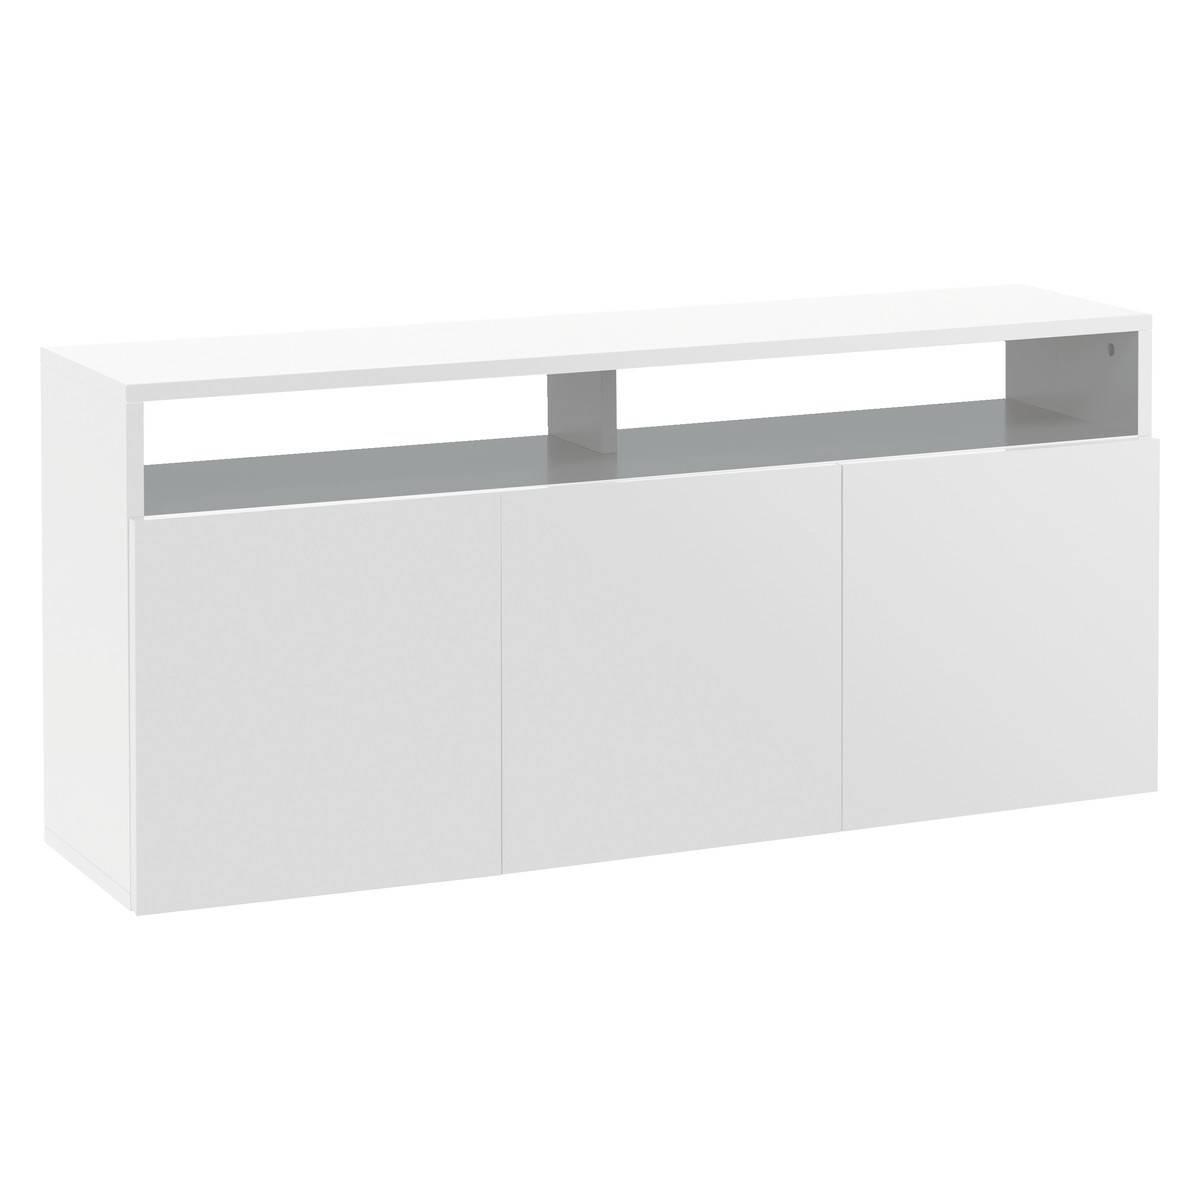 Kubrik White High Gloss Large Sideboard | Buy Now At Habitat Uk Pertaining To Sideboard White Wood (View 5 of 20)